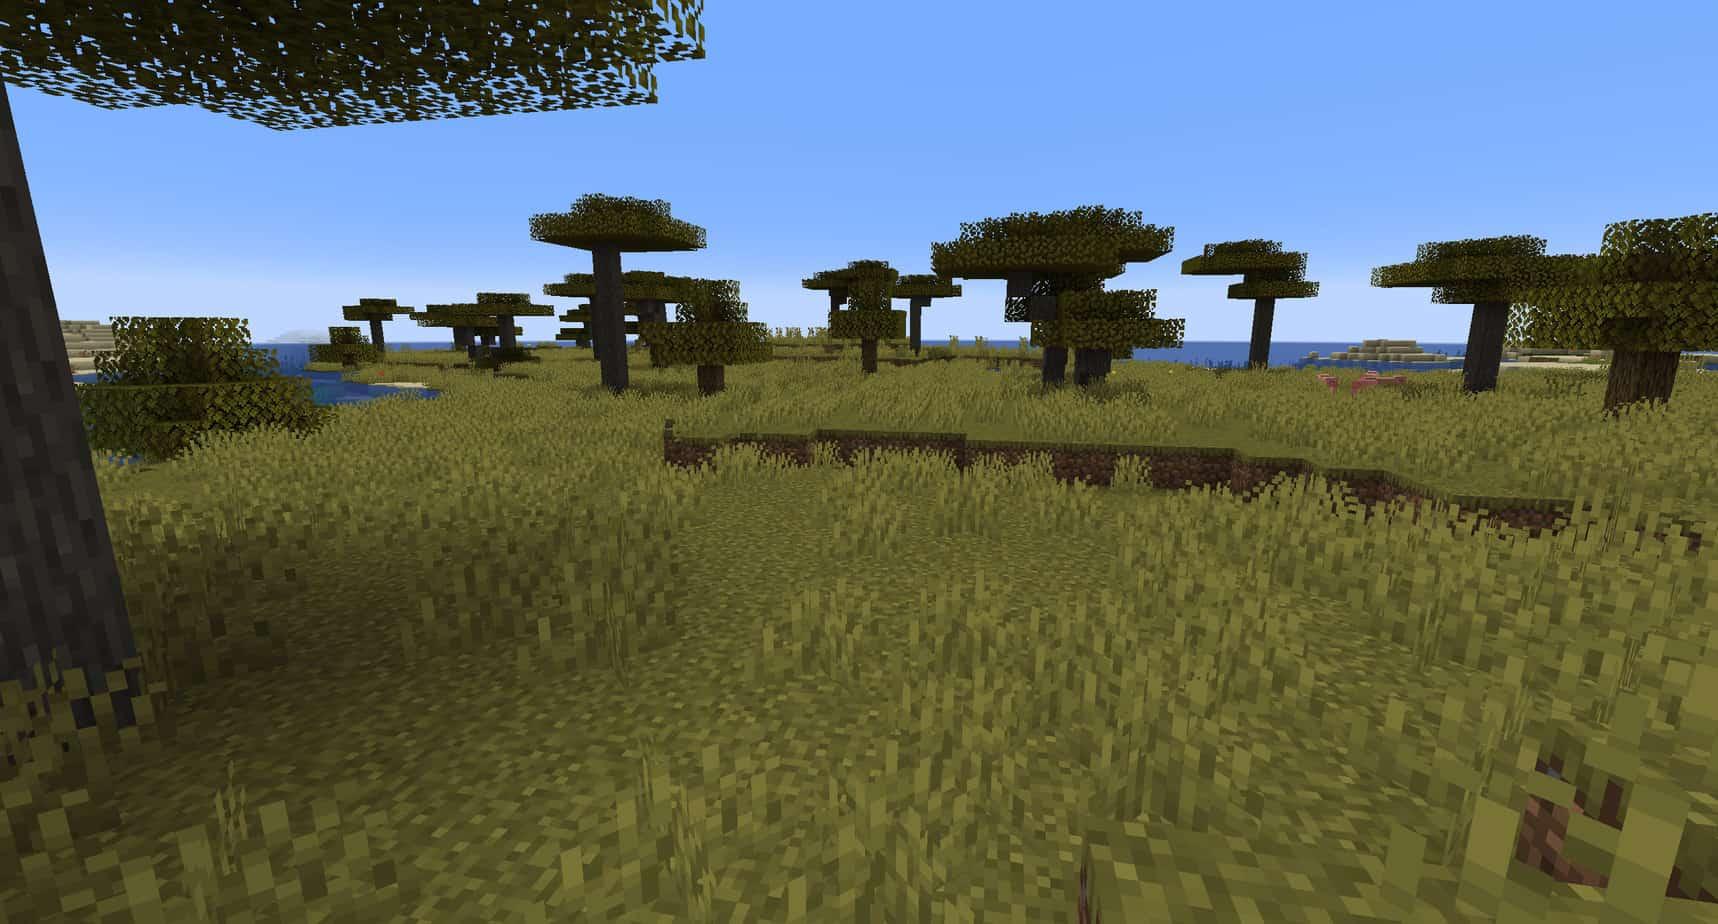 Minecraft Savannah Biome